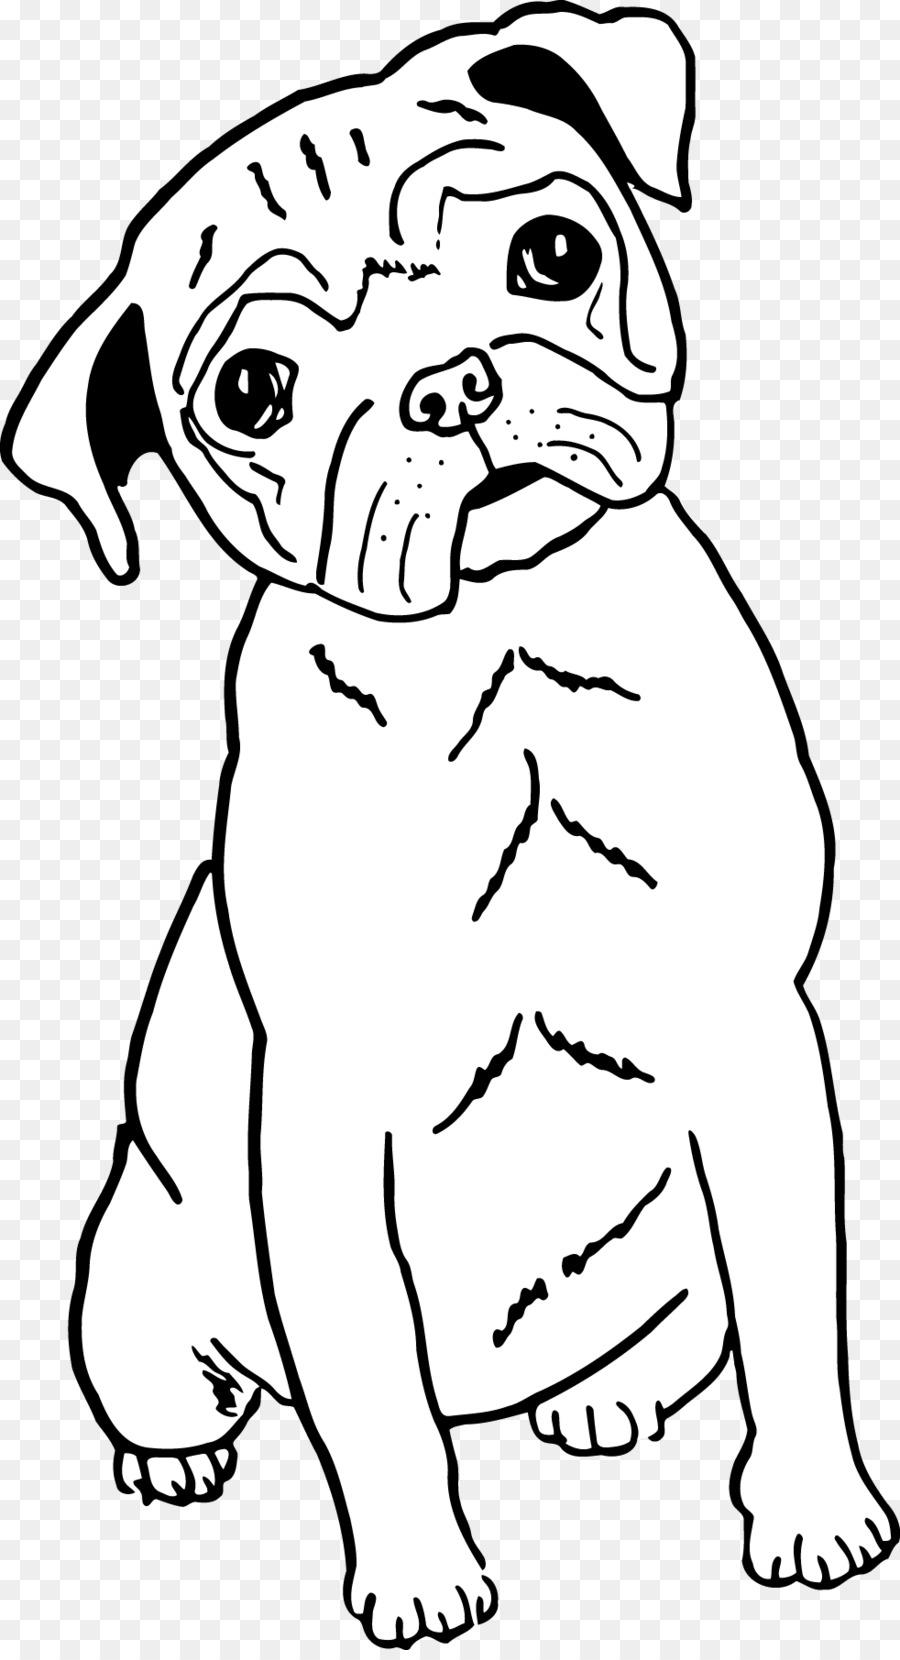 Cachorro Bigotes de Perro de la raza Labrador Retriever Pug ...